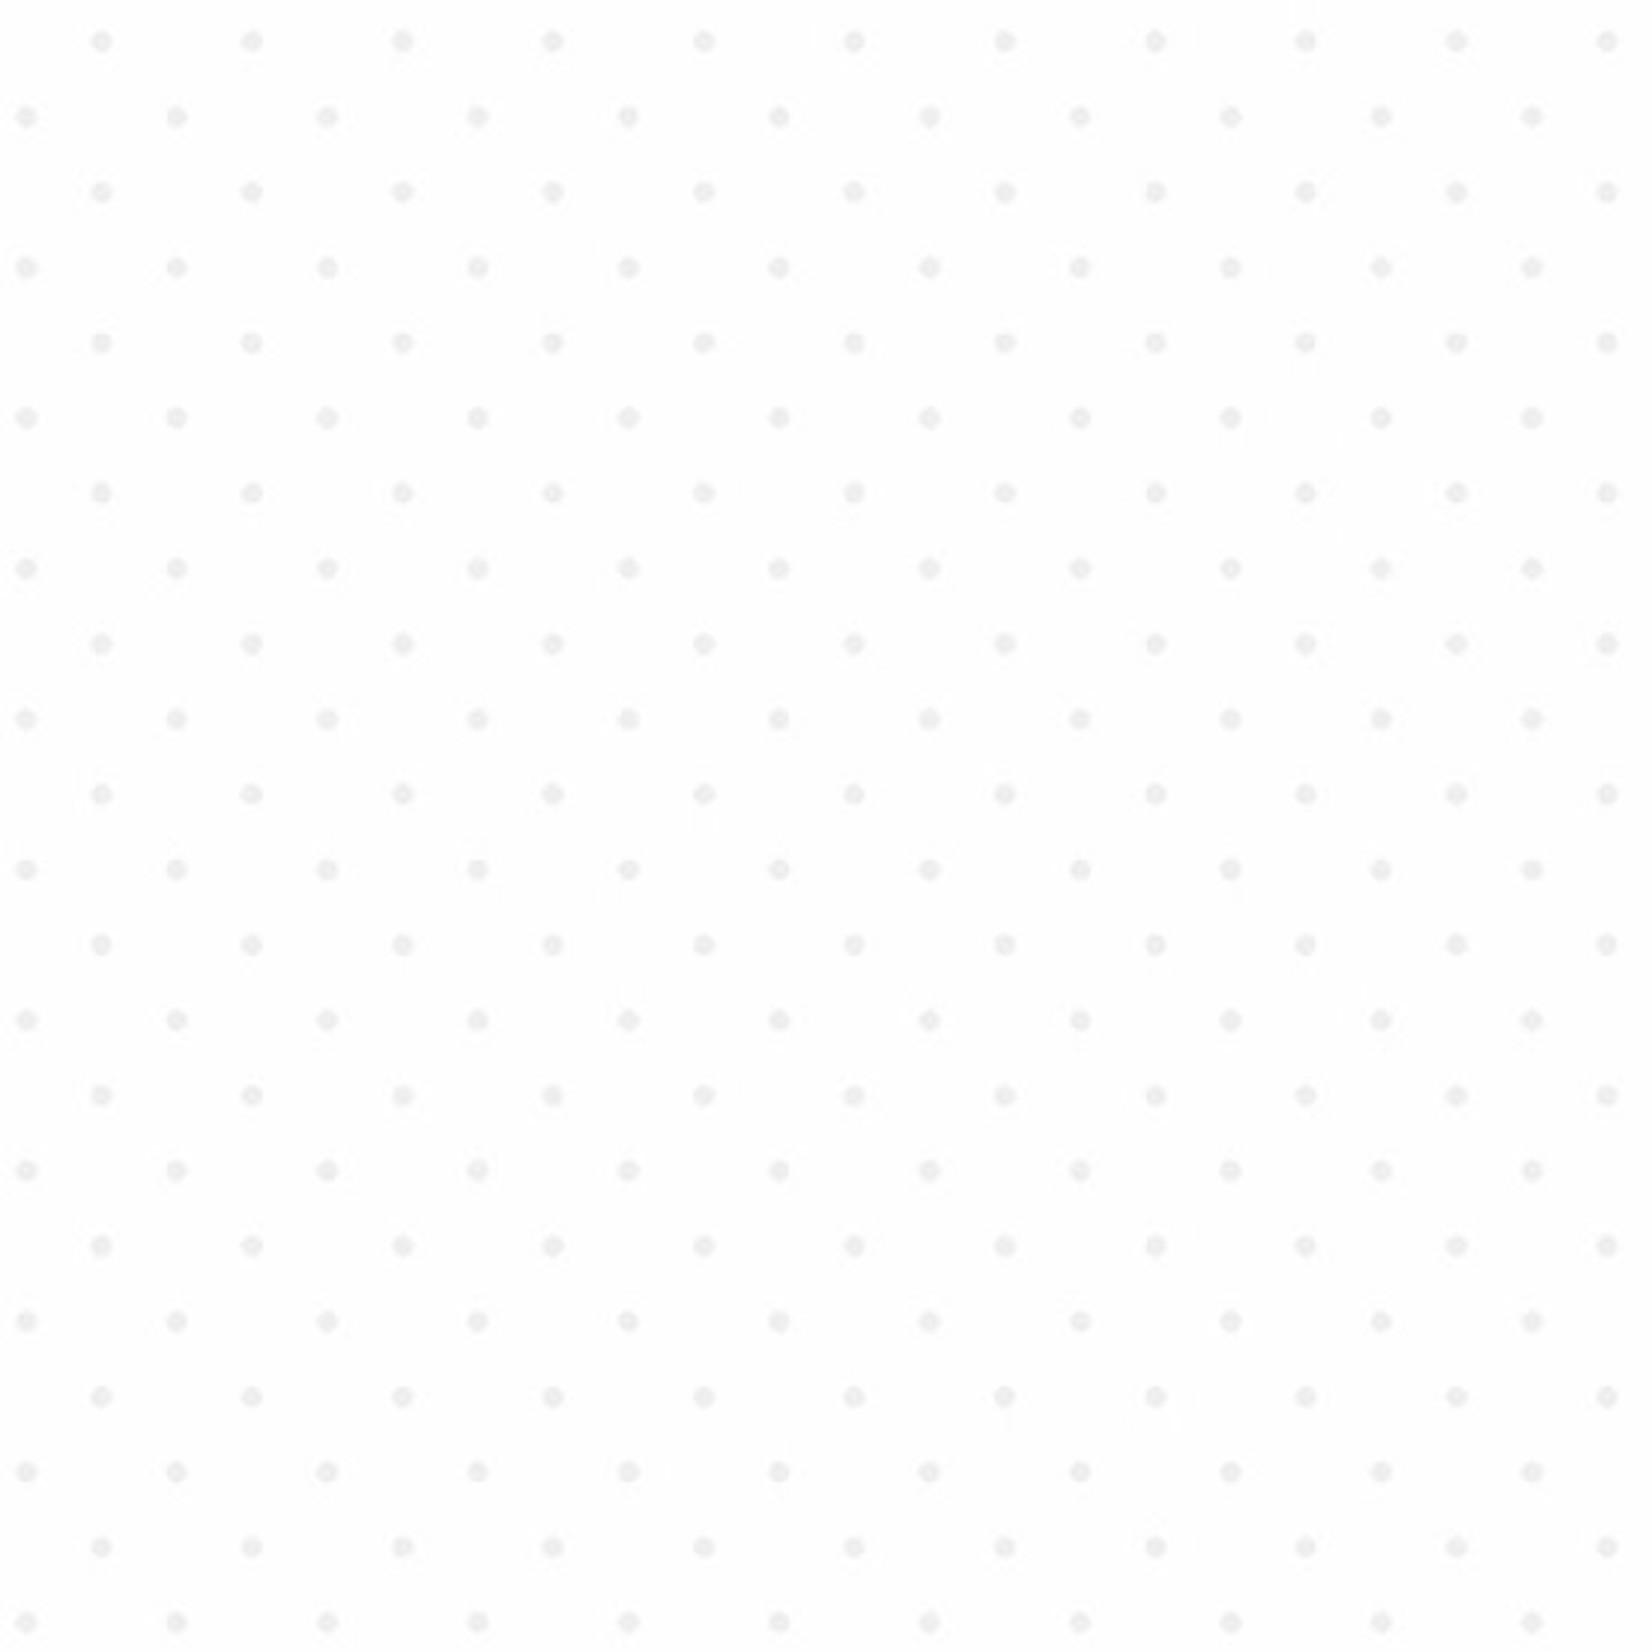 ANDOVER Century Whites, Swiss Dots CS-9689-WW $0.18 per cm or $18/m